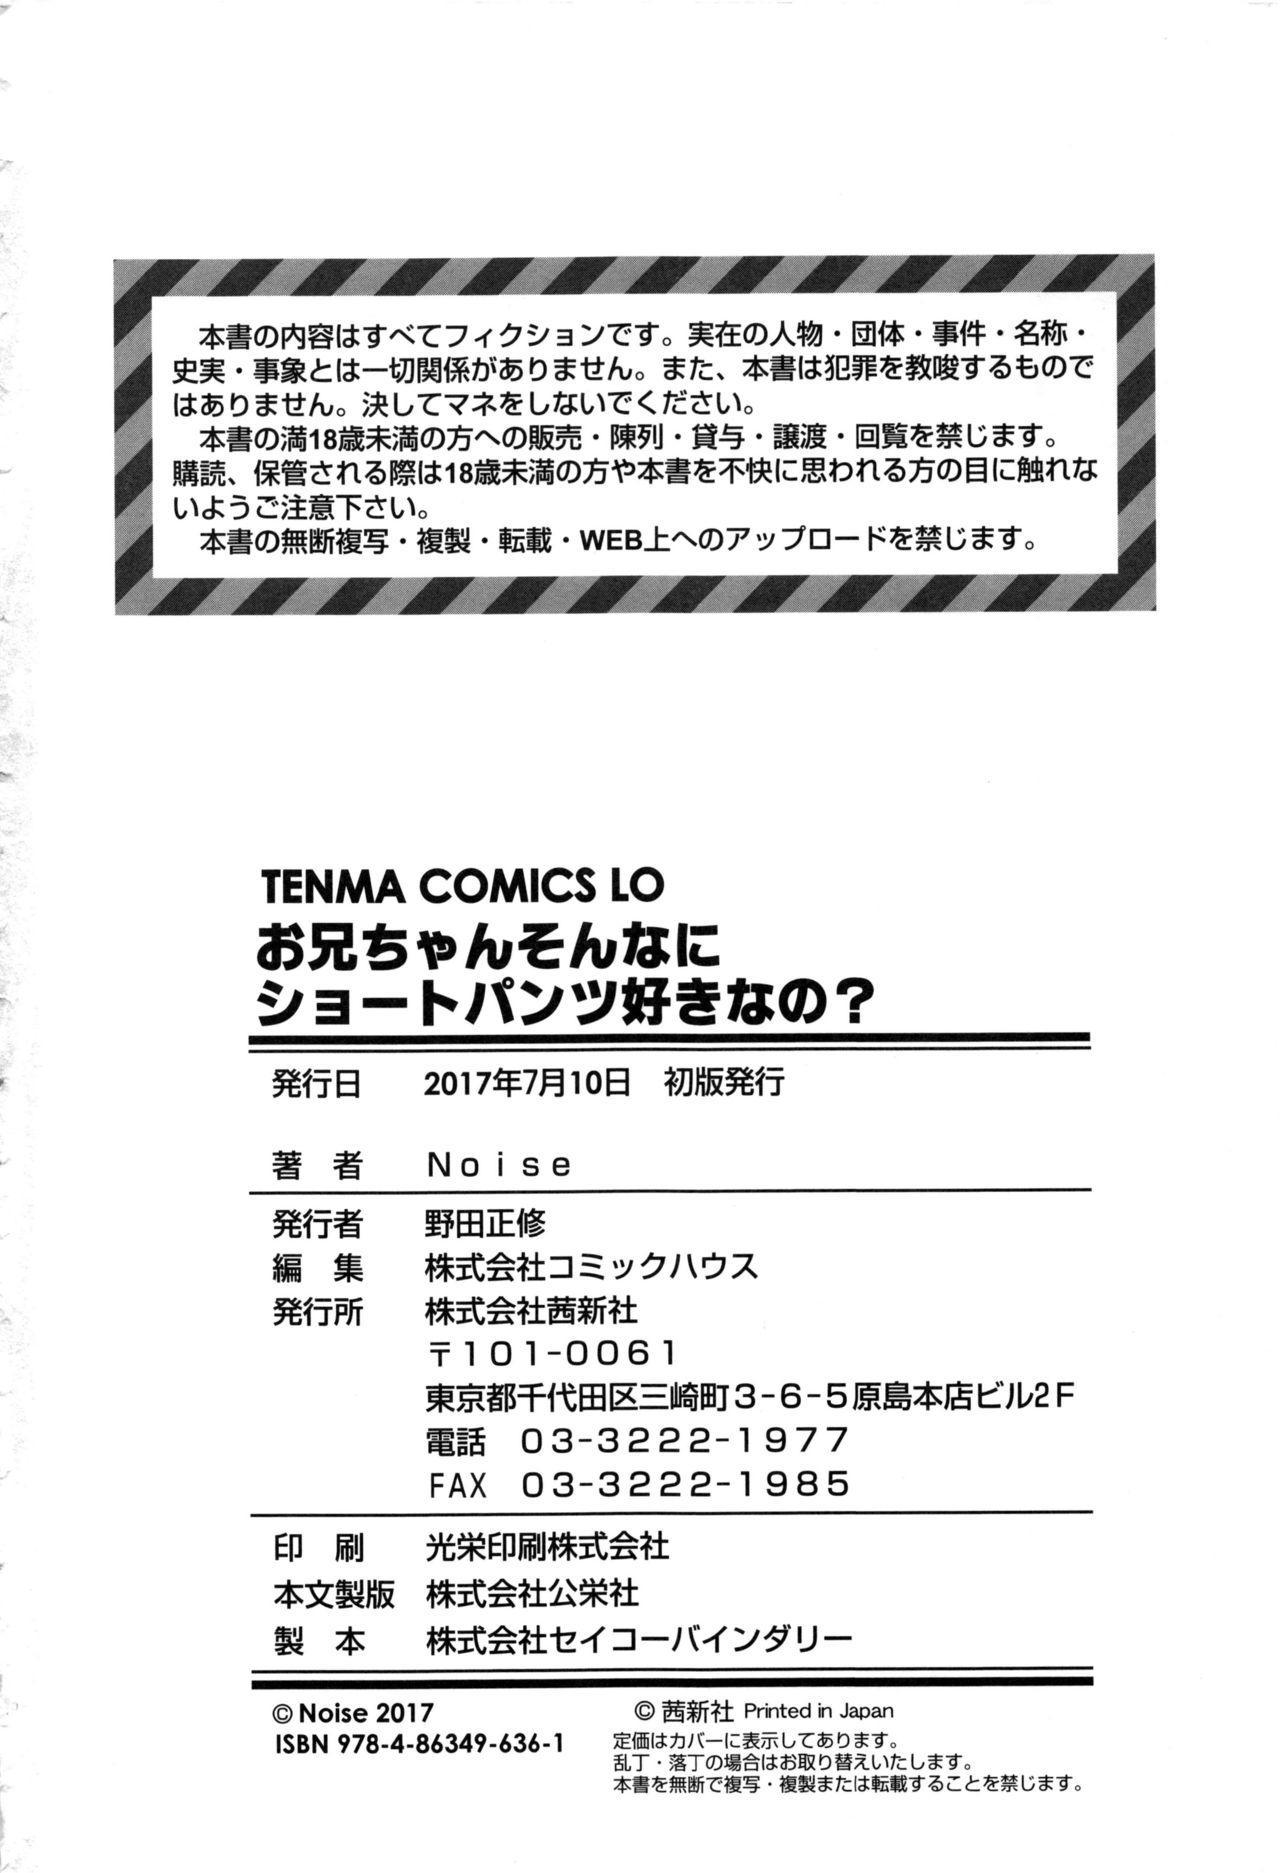 Onii-chan Sonna ni Short Pants Suki nano? 197